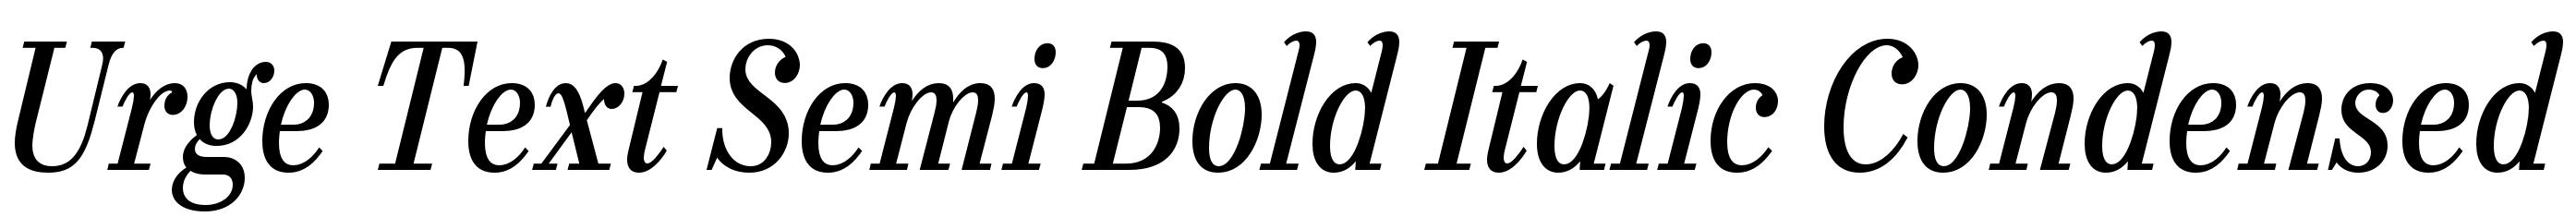 Urge Text Semi Bold Italic Condensed